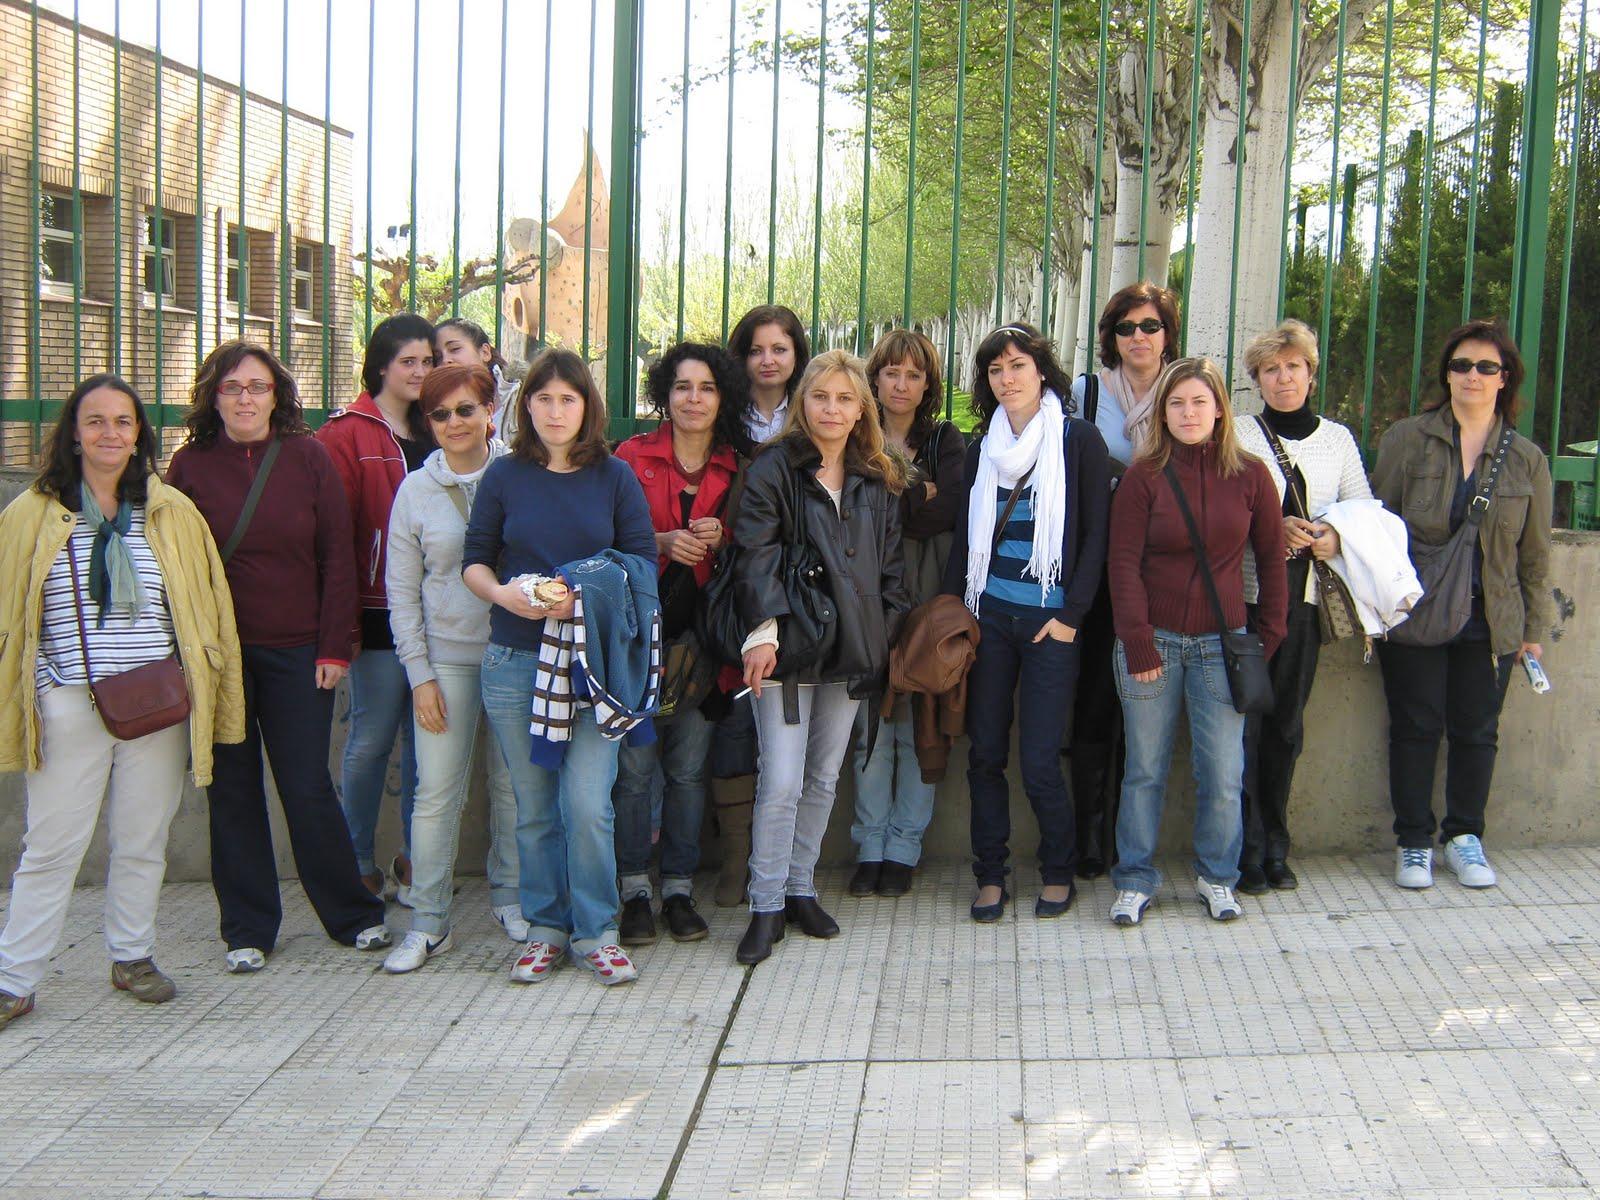 Escuela municipal de jardiner a el pinar el curso de for Pepe garces tarifas piscina